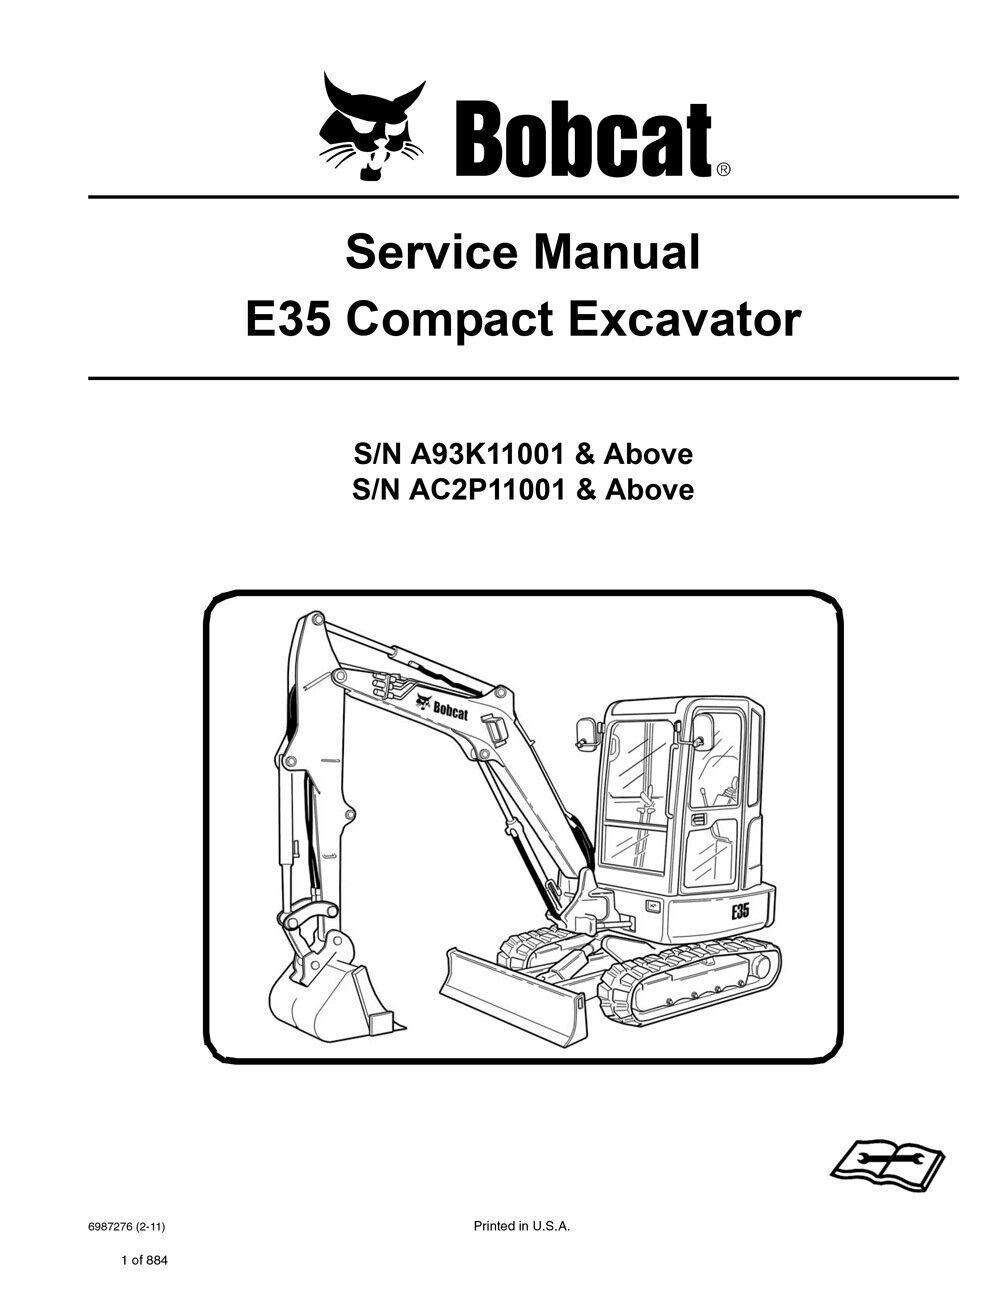 bobcat e35 parts diagram wiring schematic diagrambobcat e35 compact excavator repair service manual 2011 rev 880 pgs bobcat t250 parts diagram bobcat